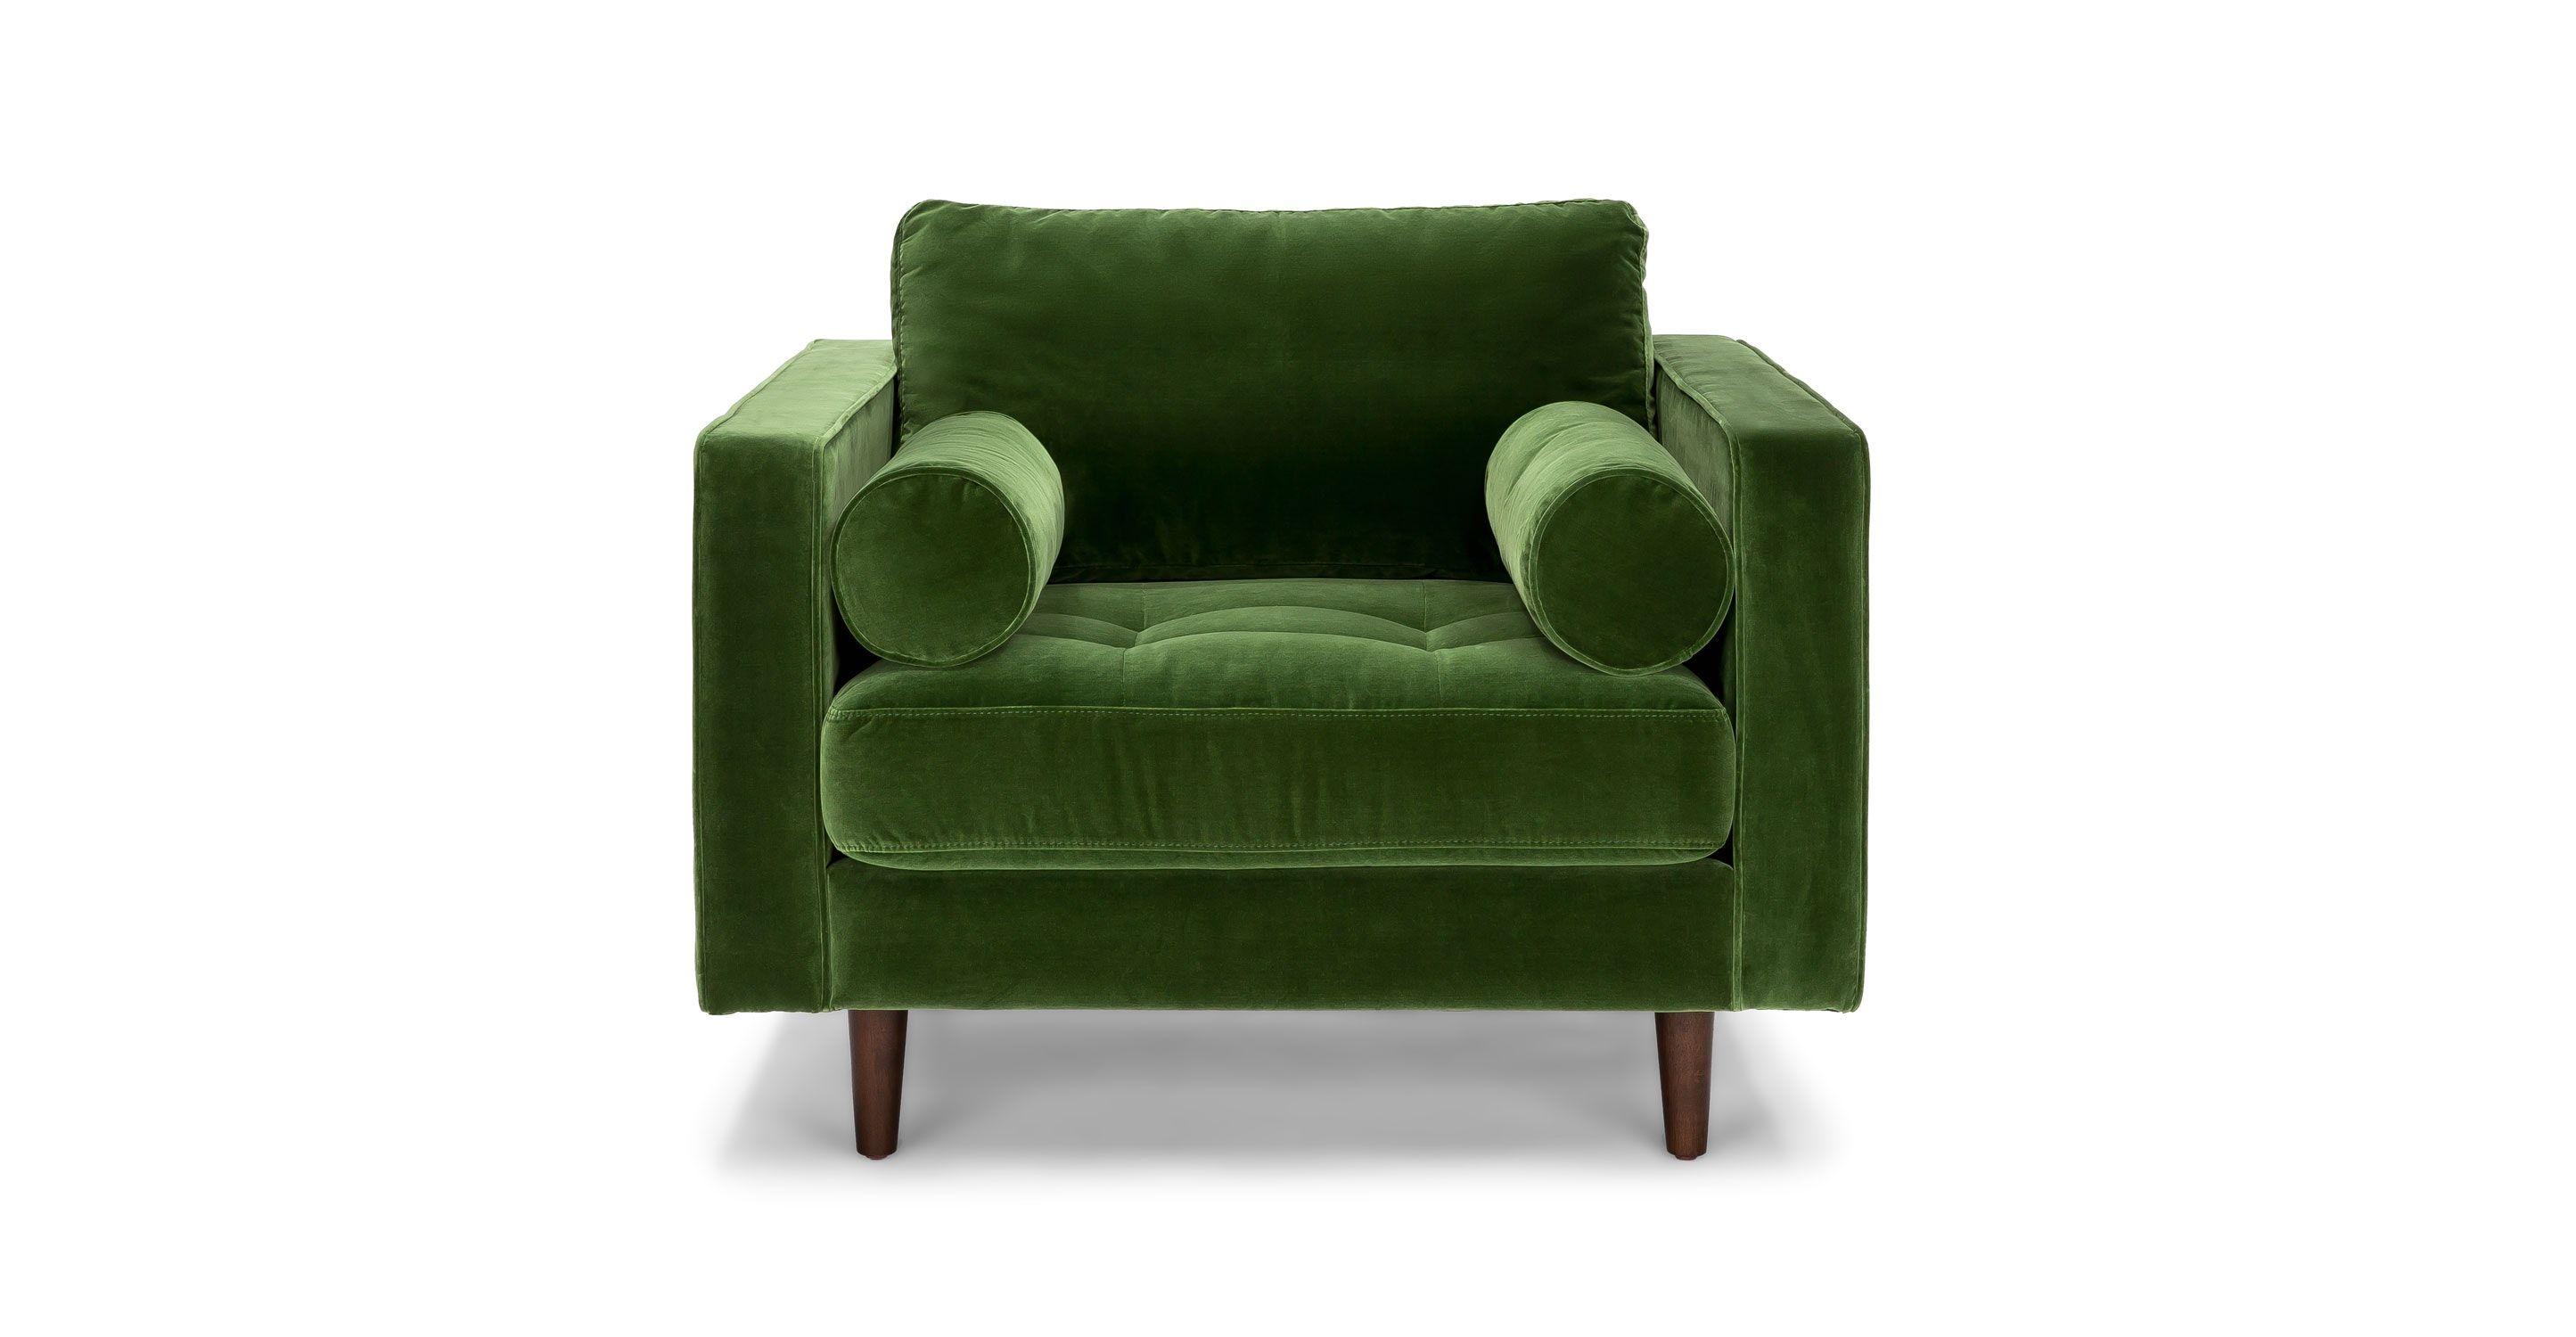 Green Velvet Tufted Chair With Bolsters